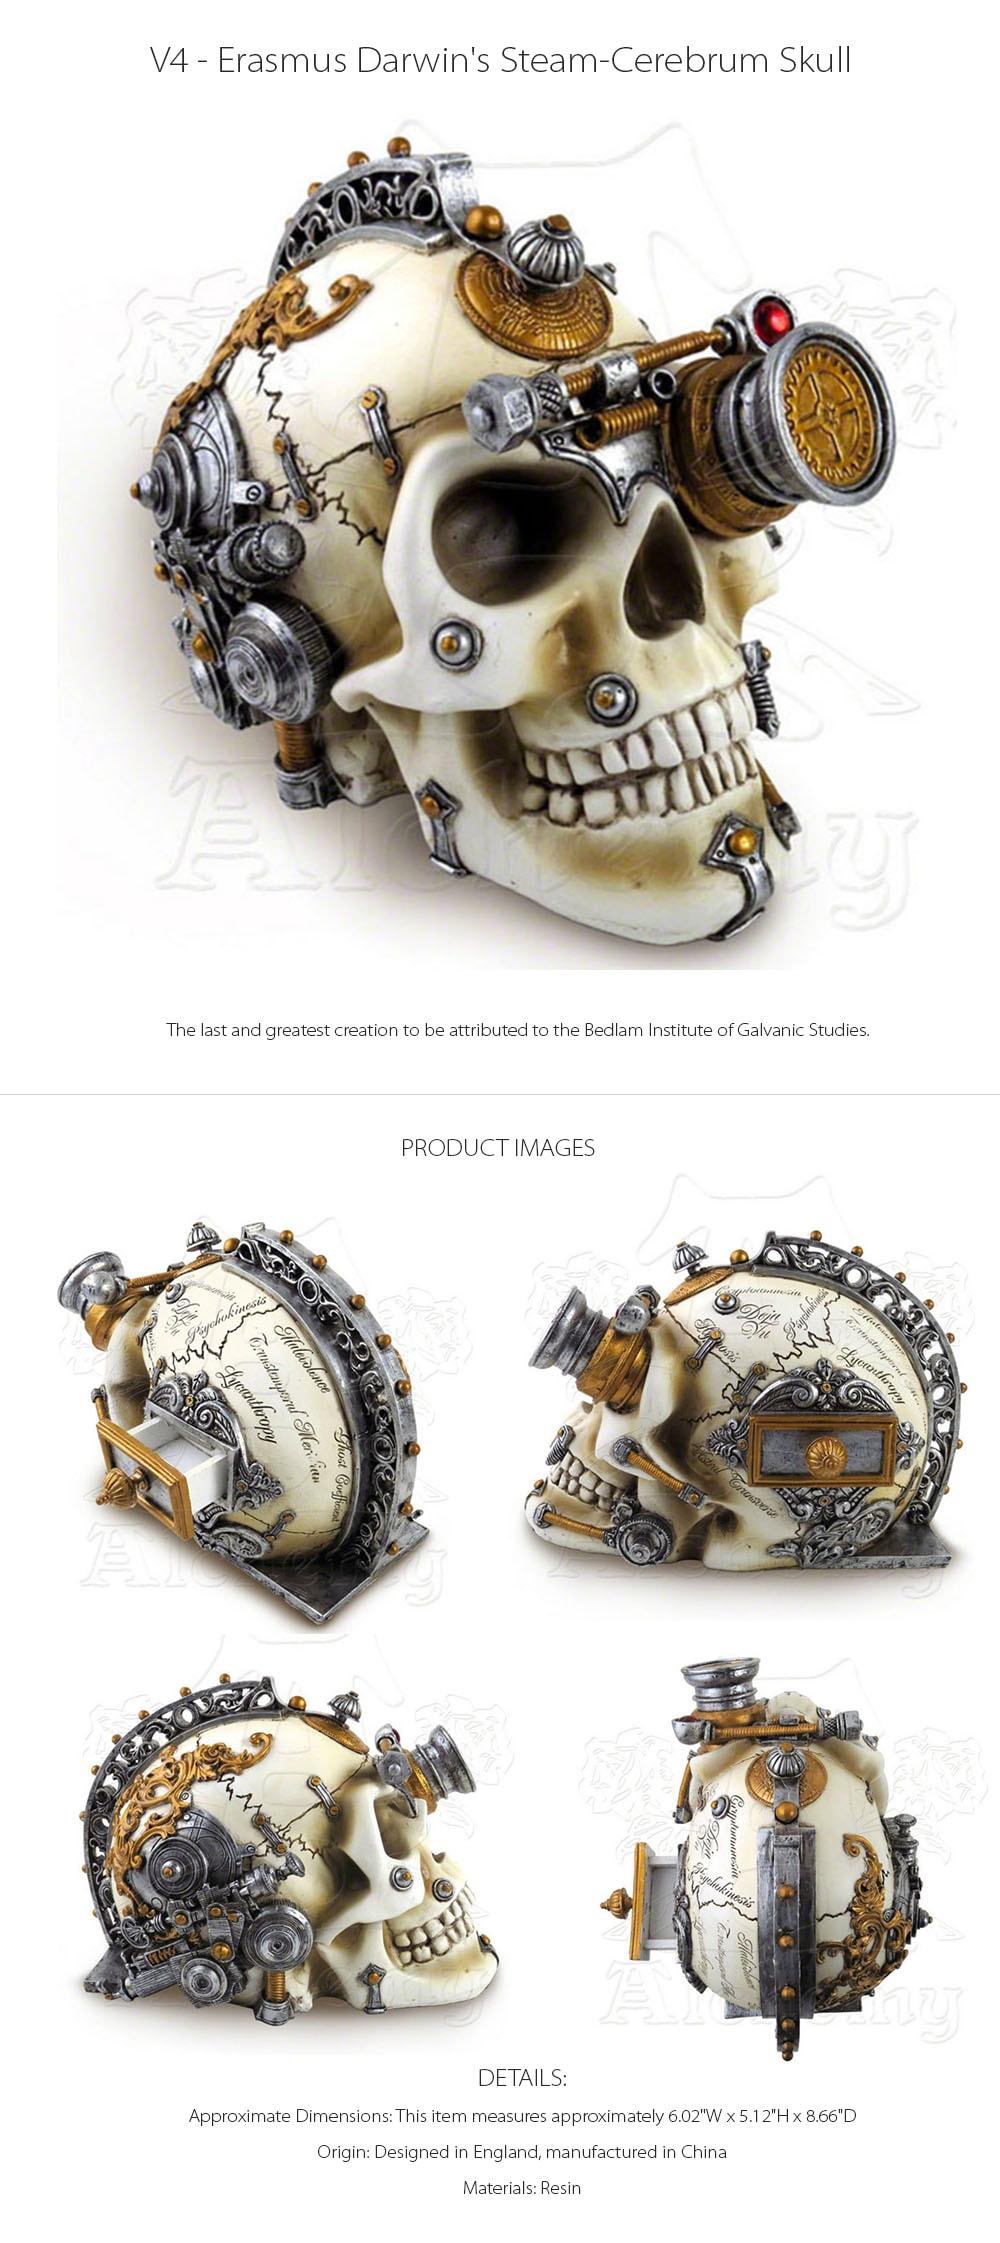 Erasmus Darwin's Steam-Cerebrum Skull Designed in England